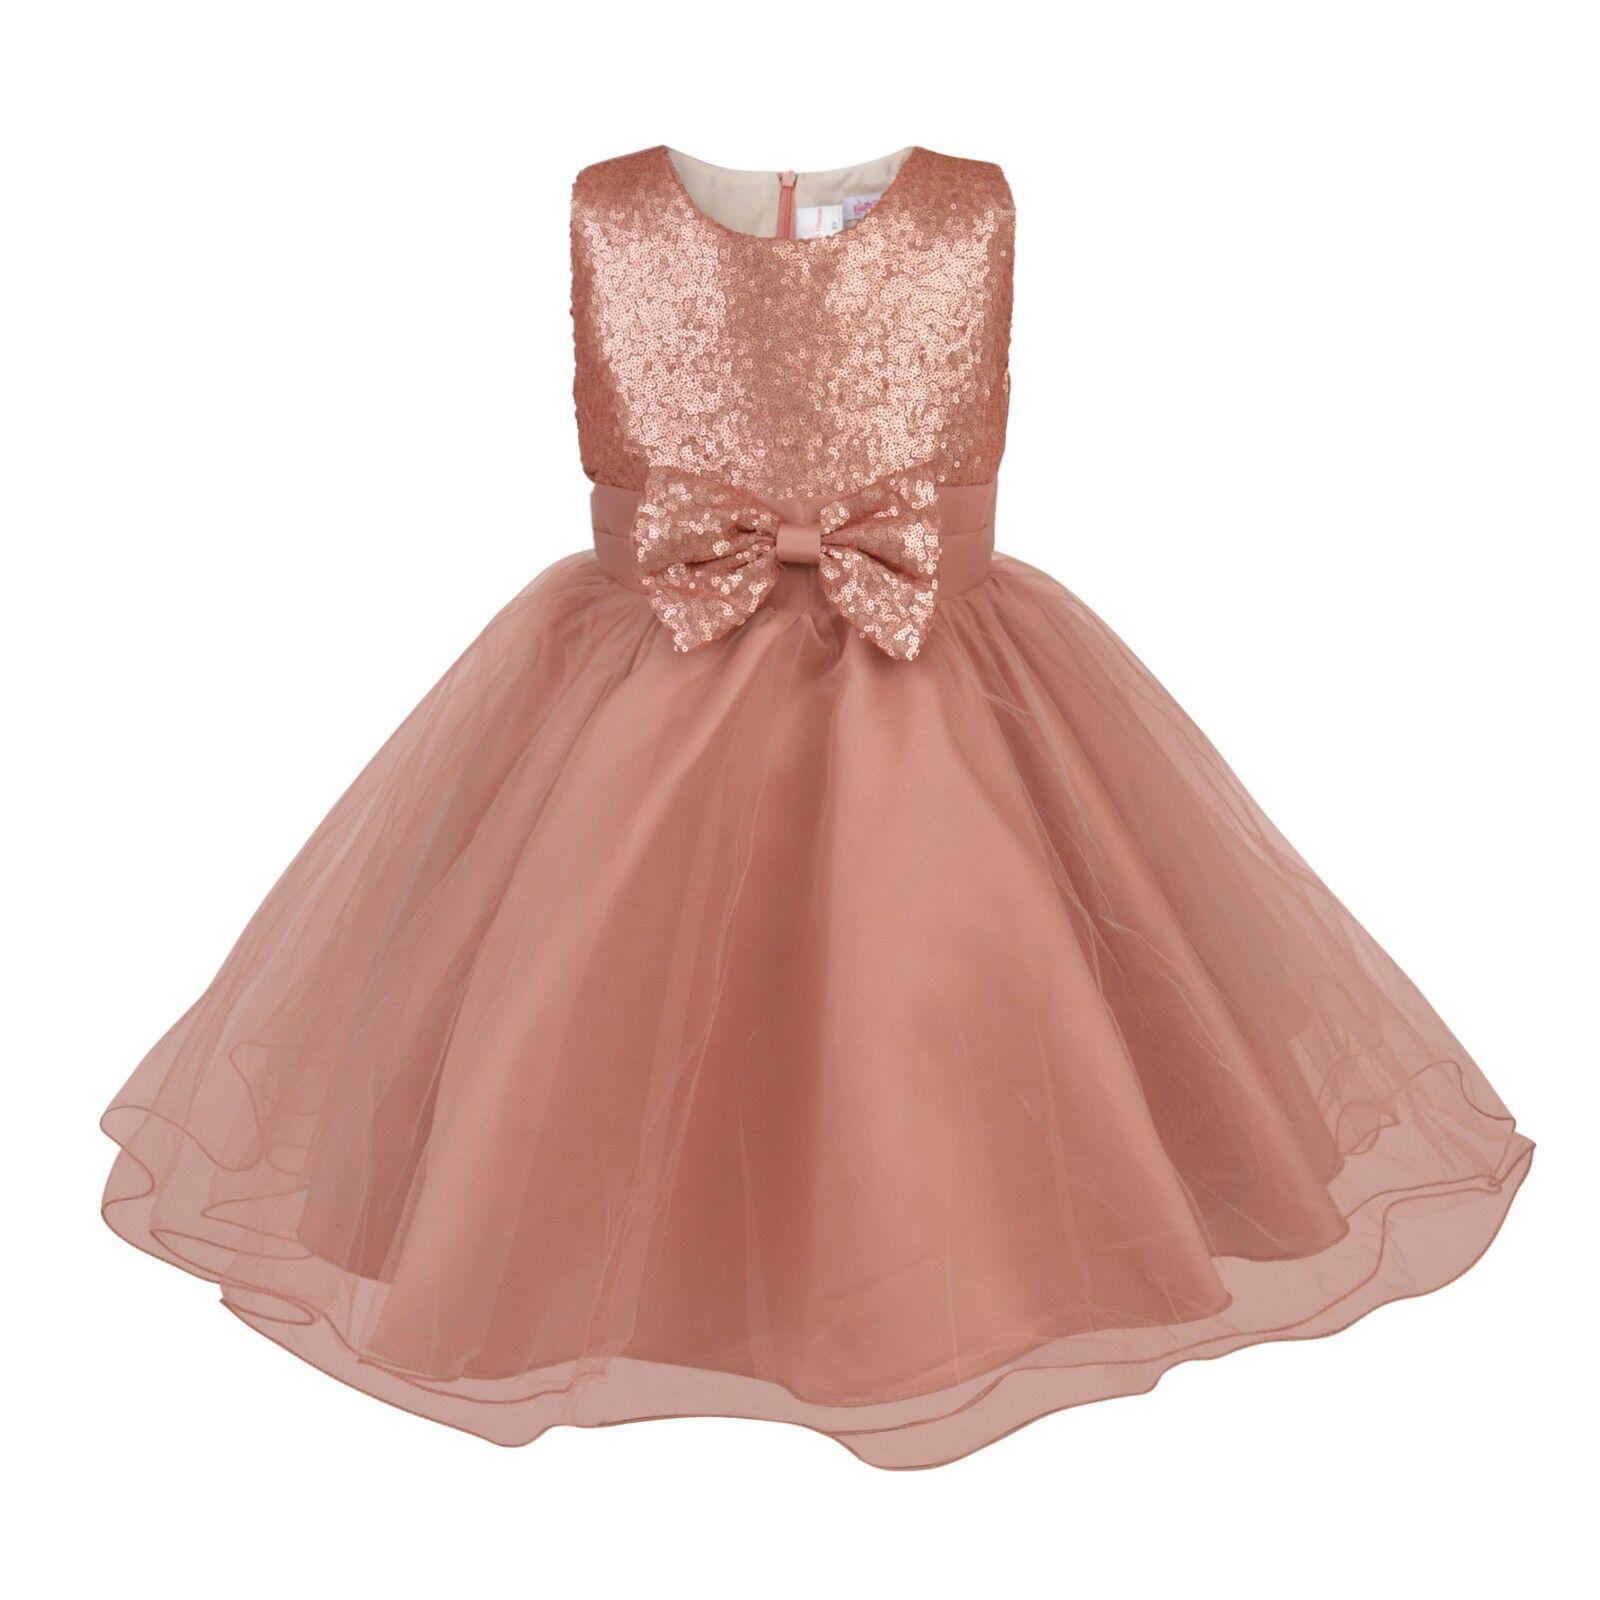 84b6f650e40e Premium Flower Girl Boutique 'Gigi' Rose Gold Full Occasion ...